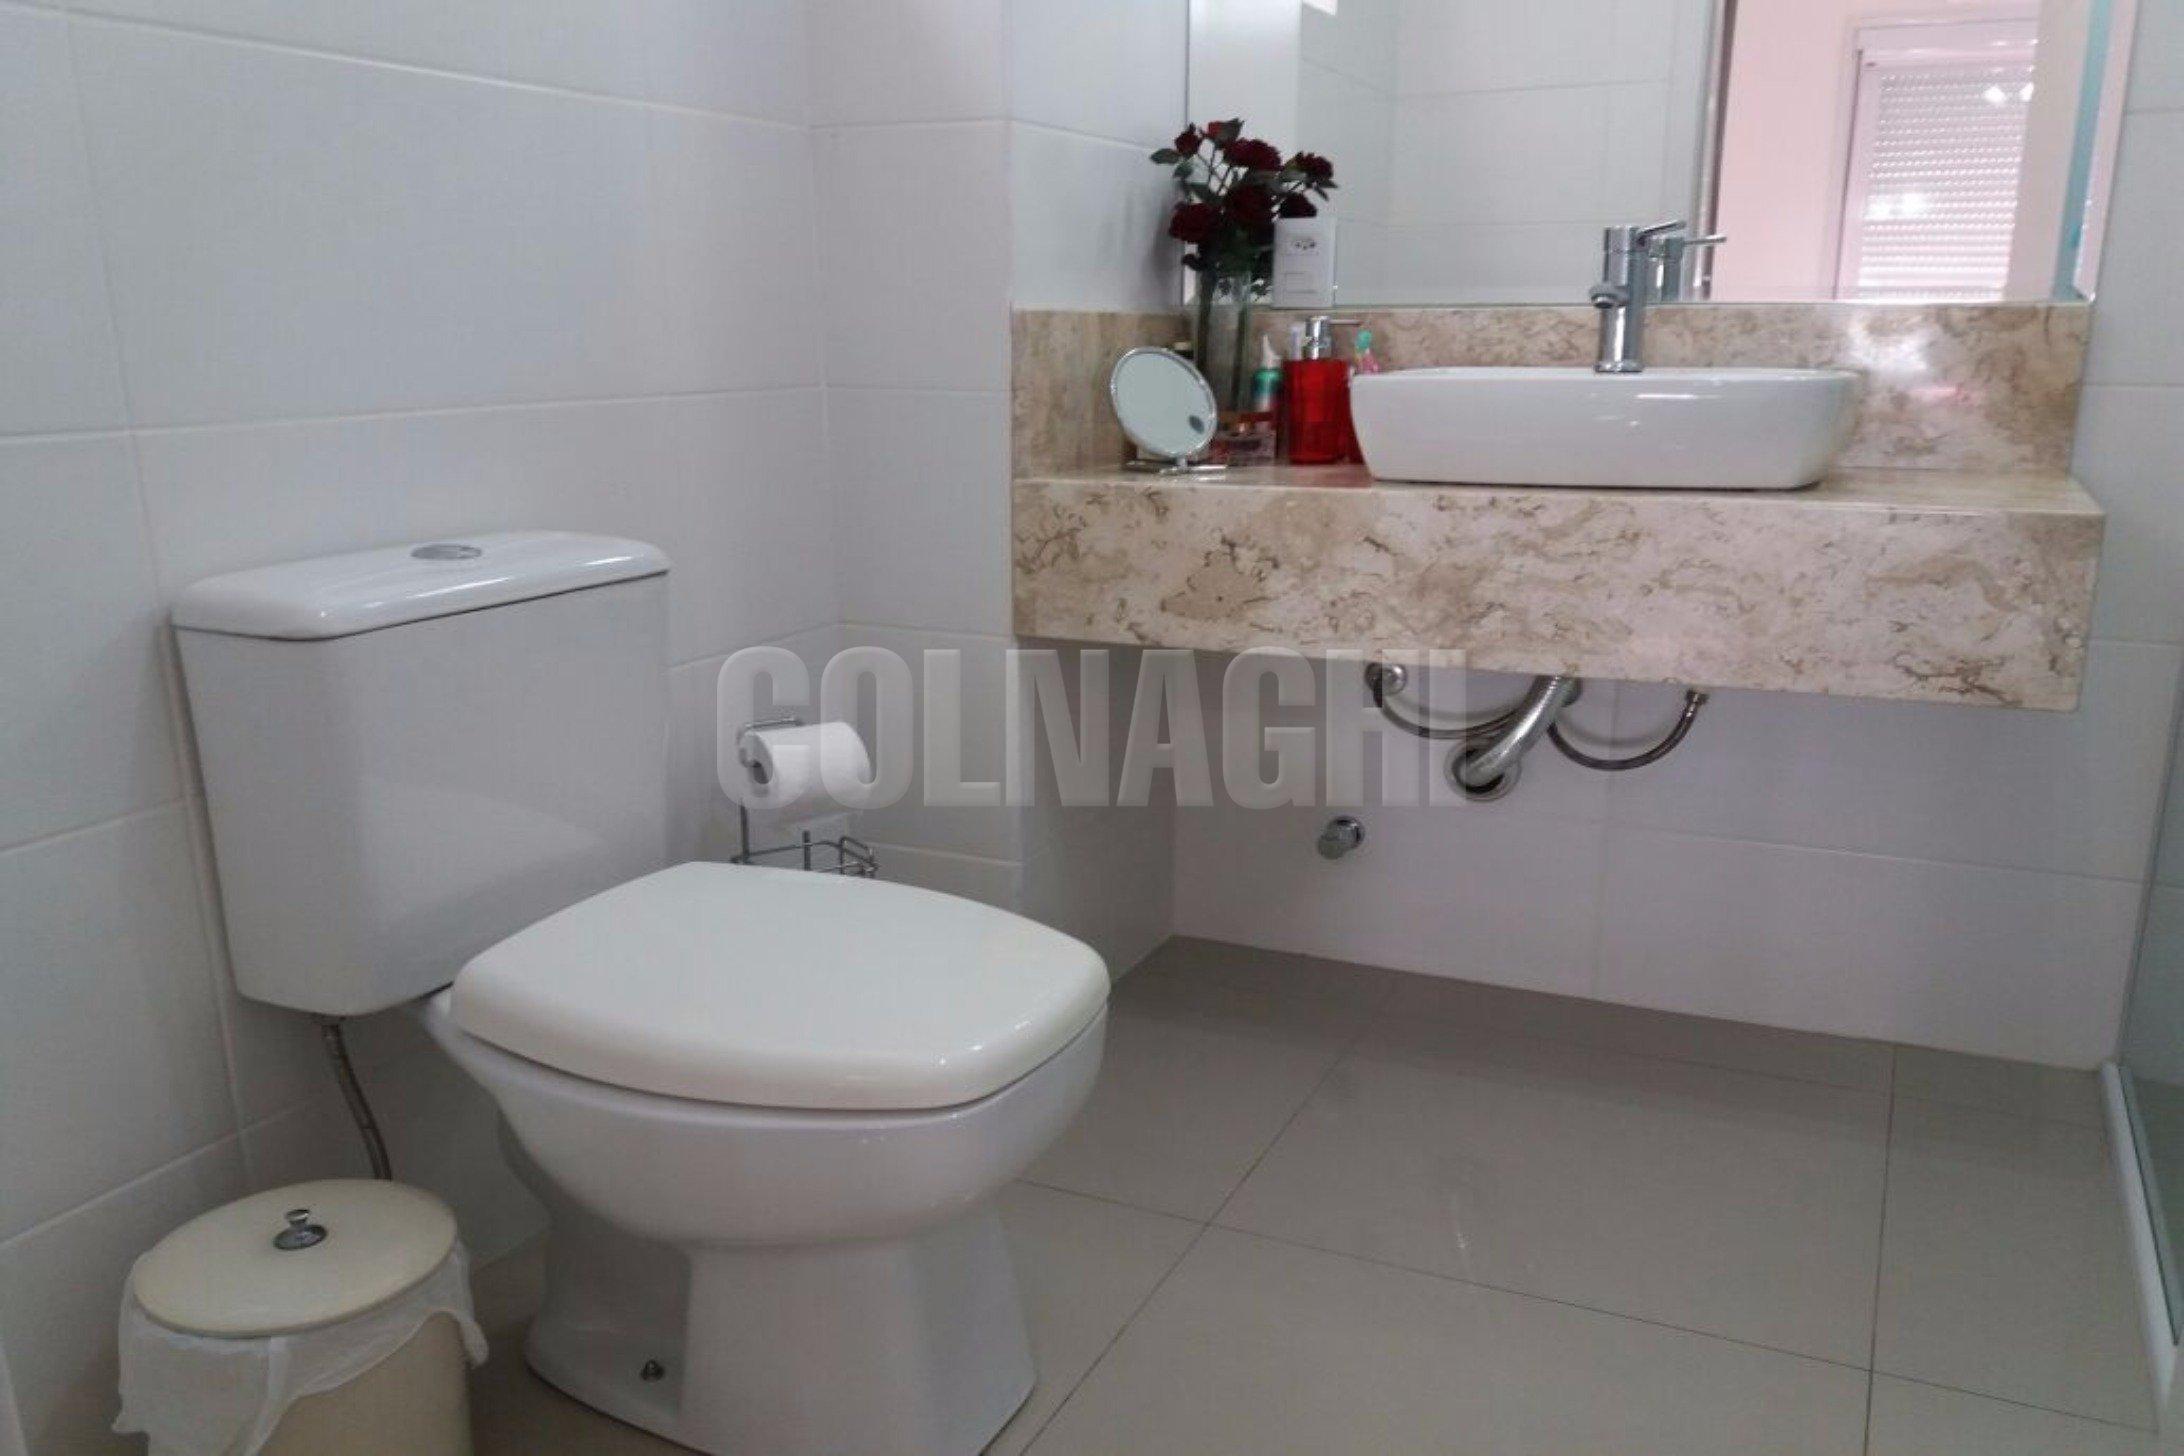 Jandir Maya Faillace - Apto 3 Dorm, Centro Historico, Porto Alegre - Foto 10